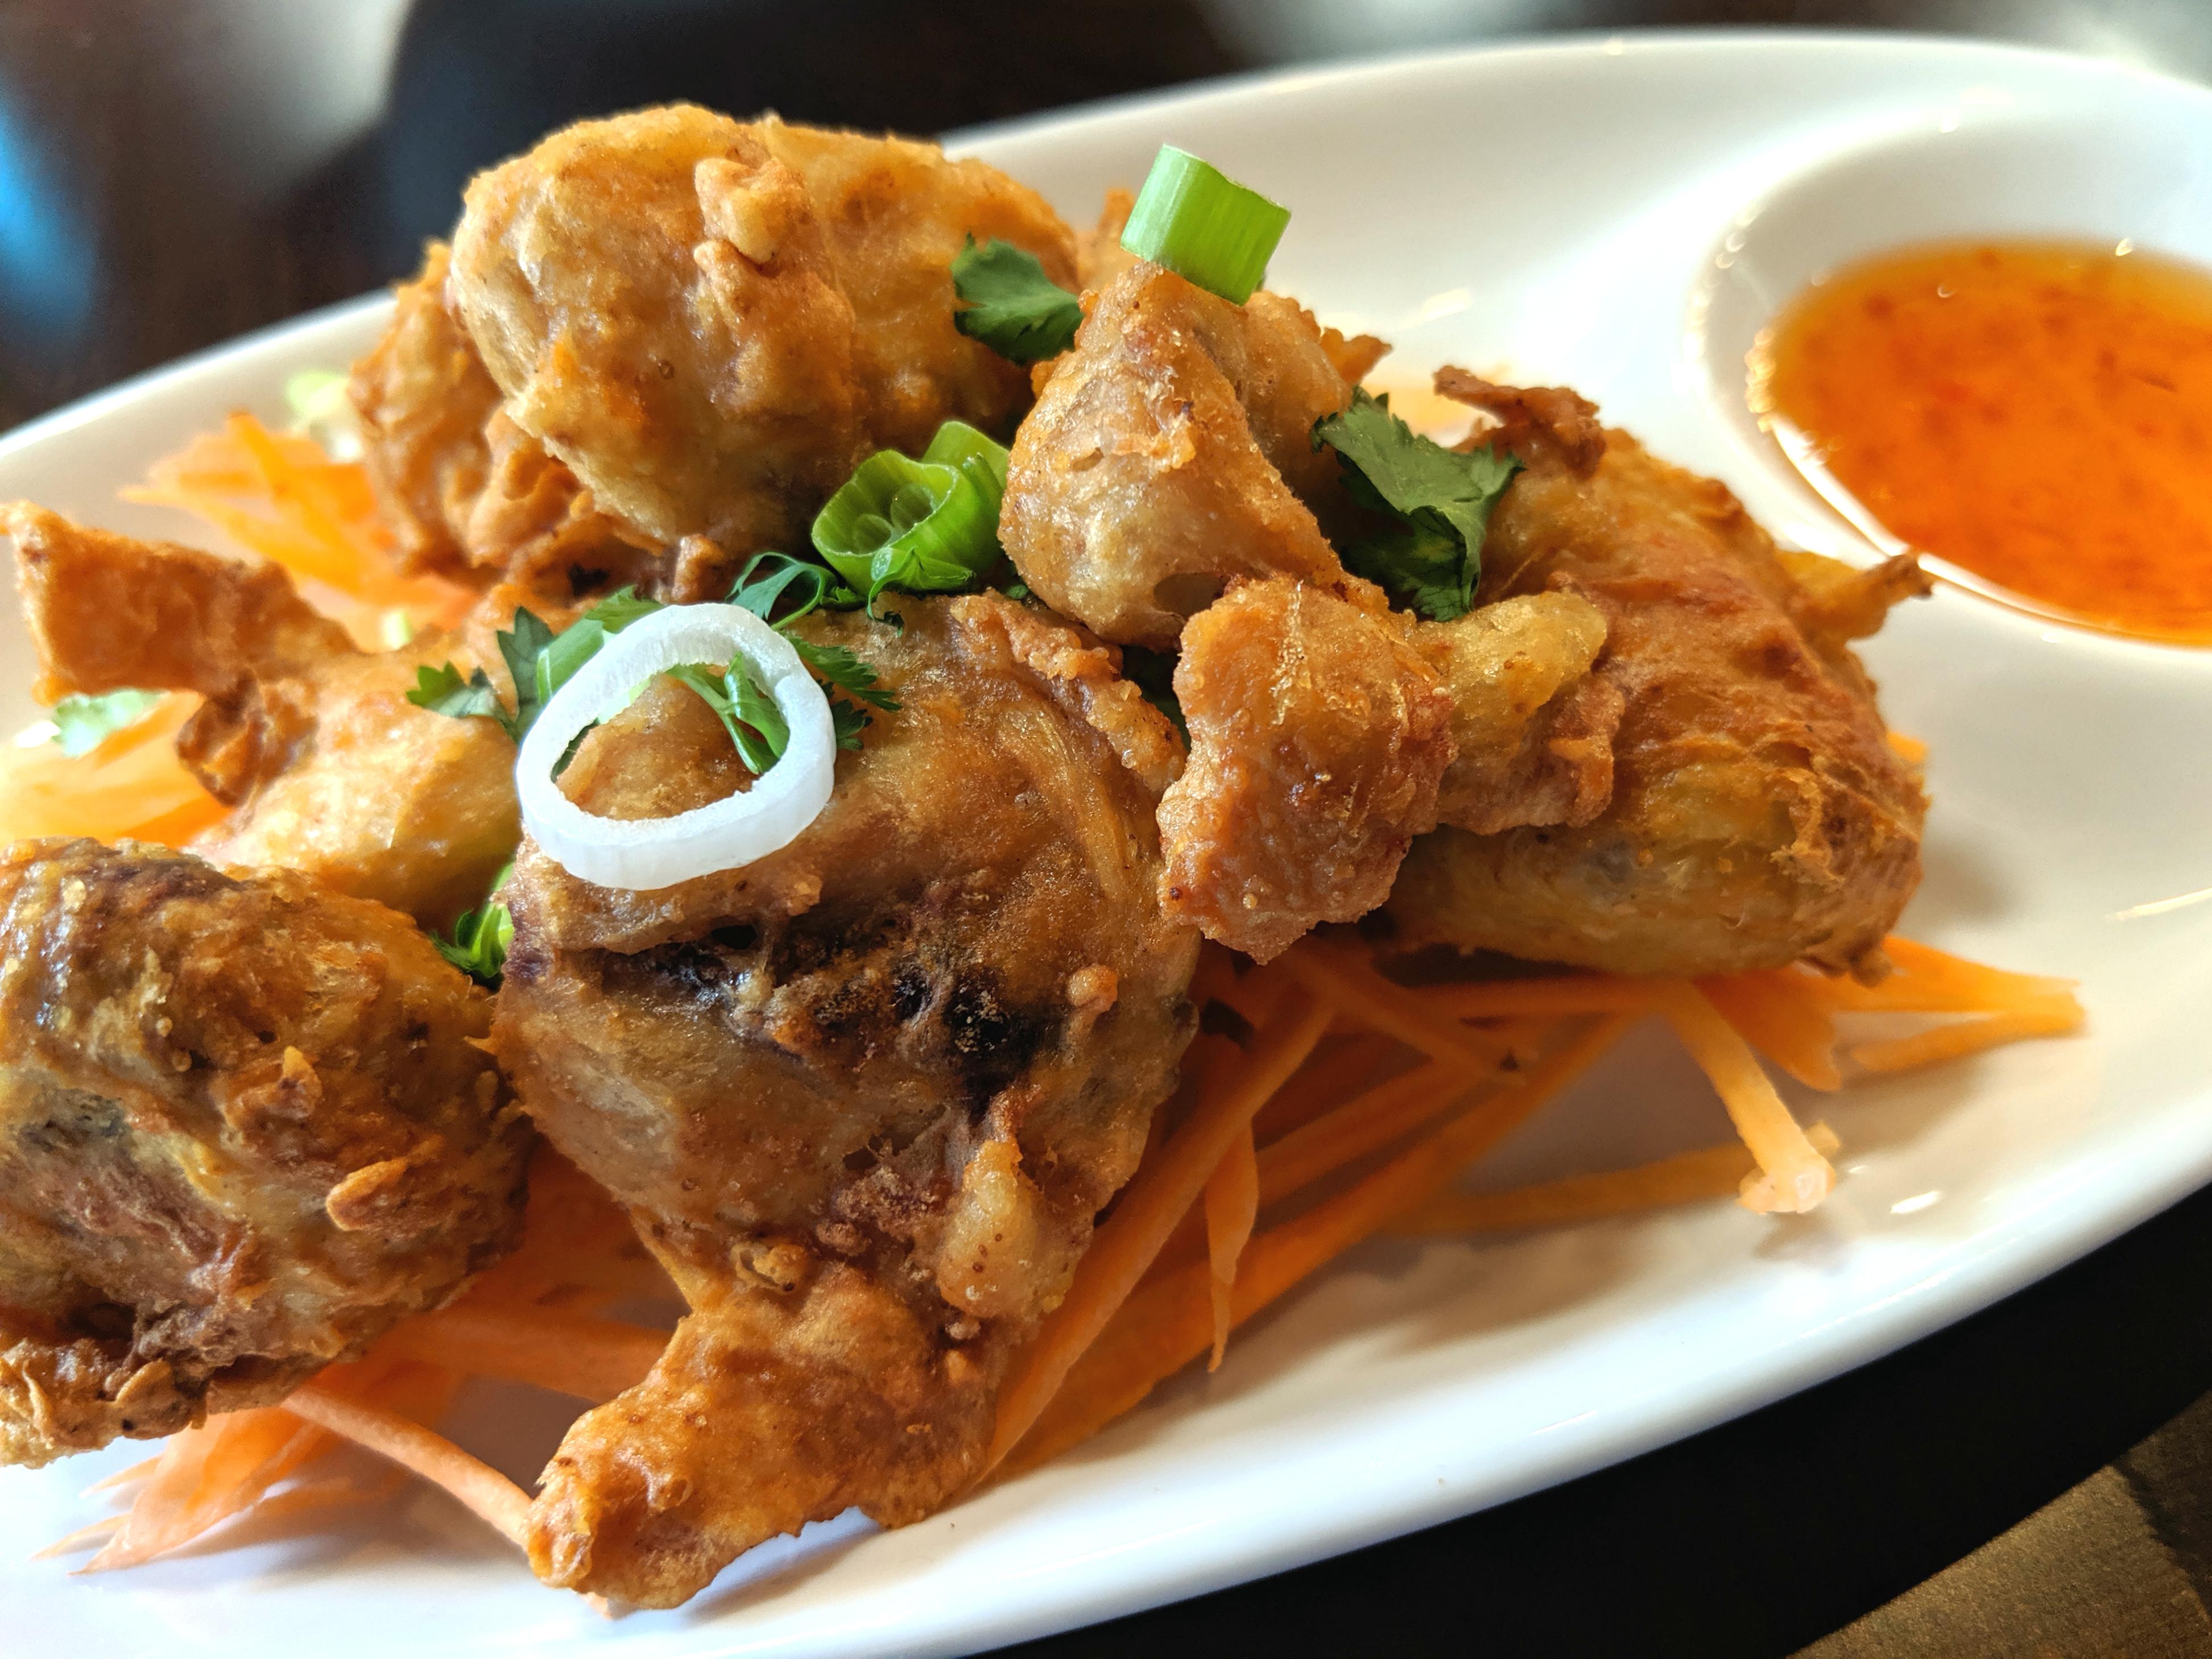 Thai Street Food Arrives in East Cambridge